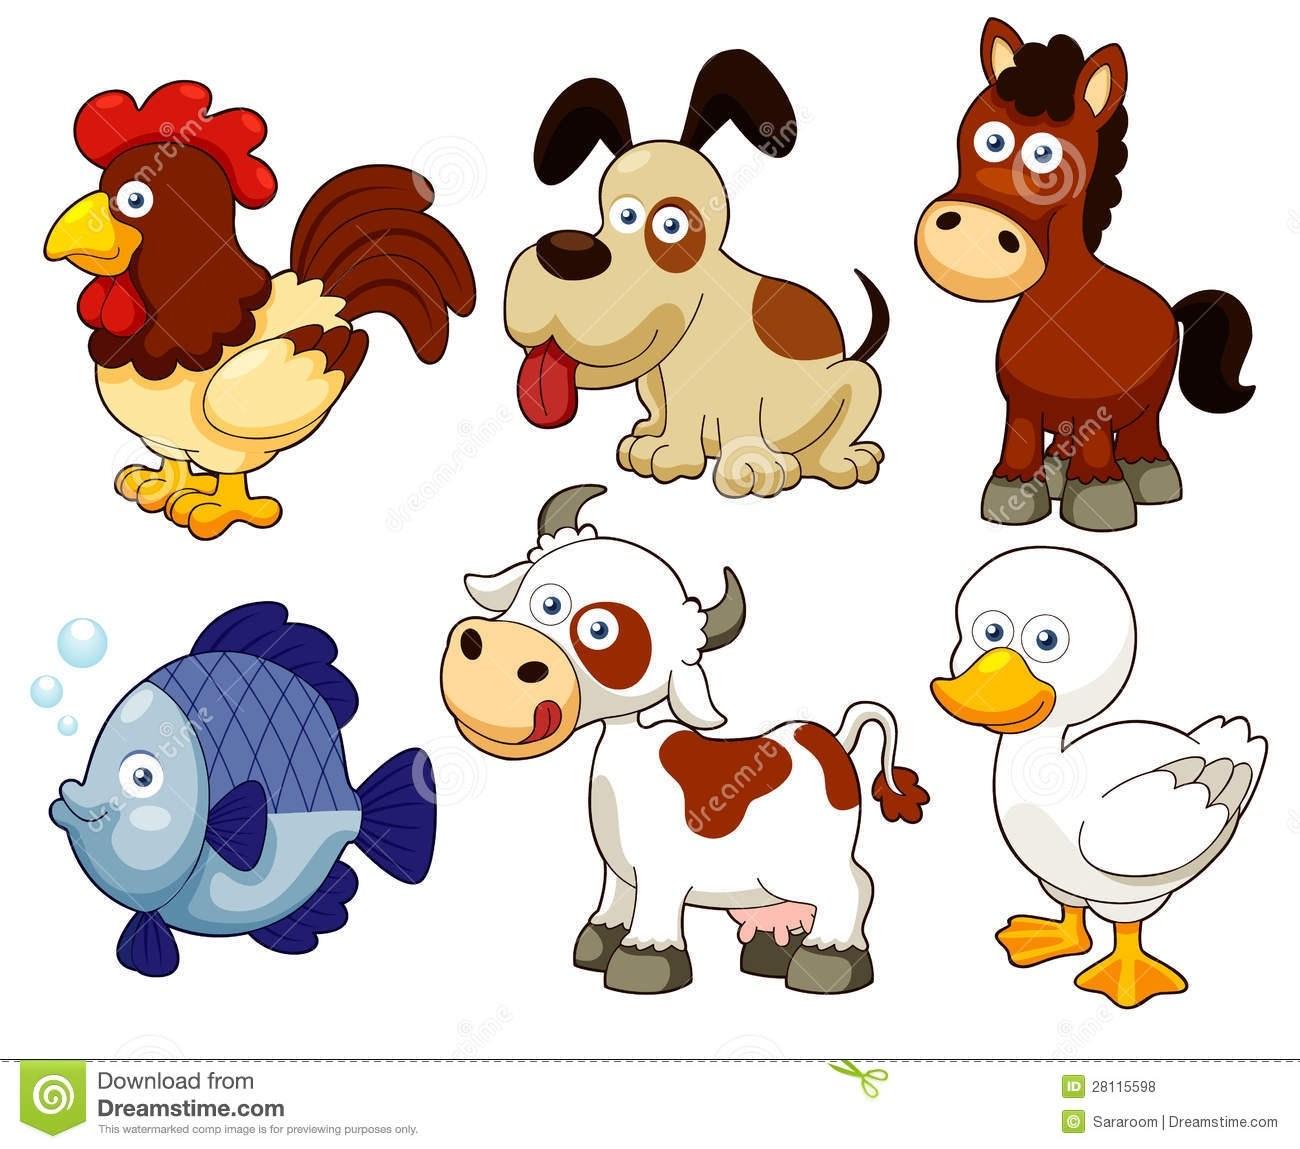 Different animals clipart 3 » Clipart Portal.